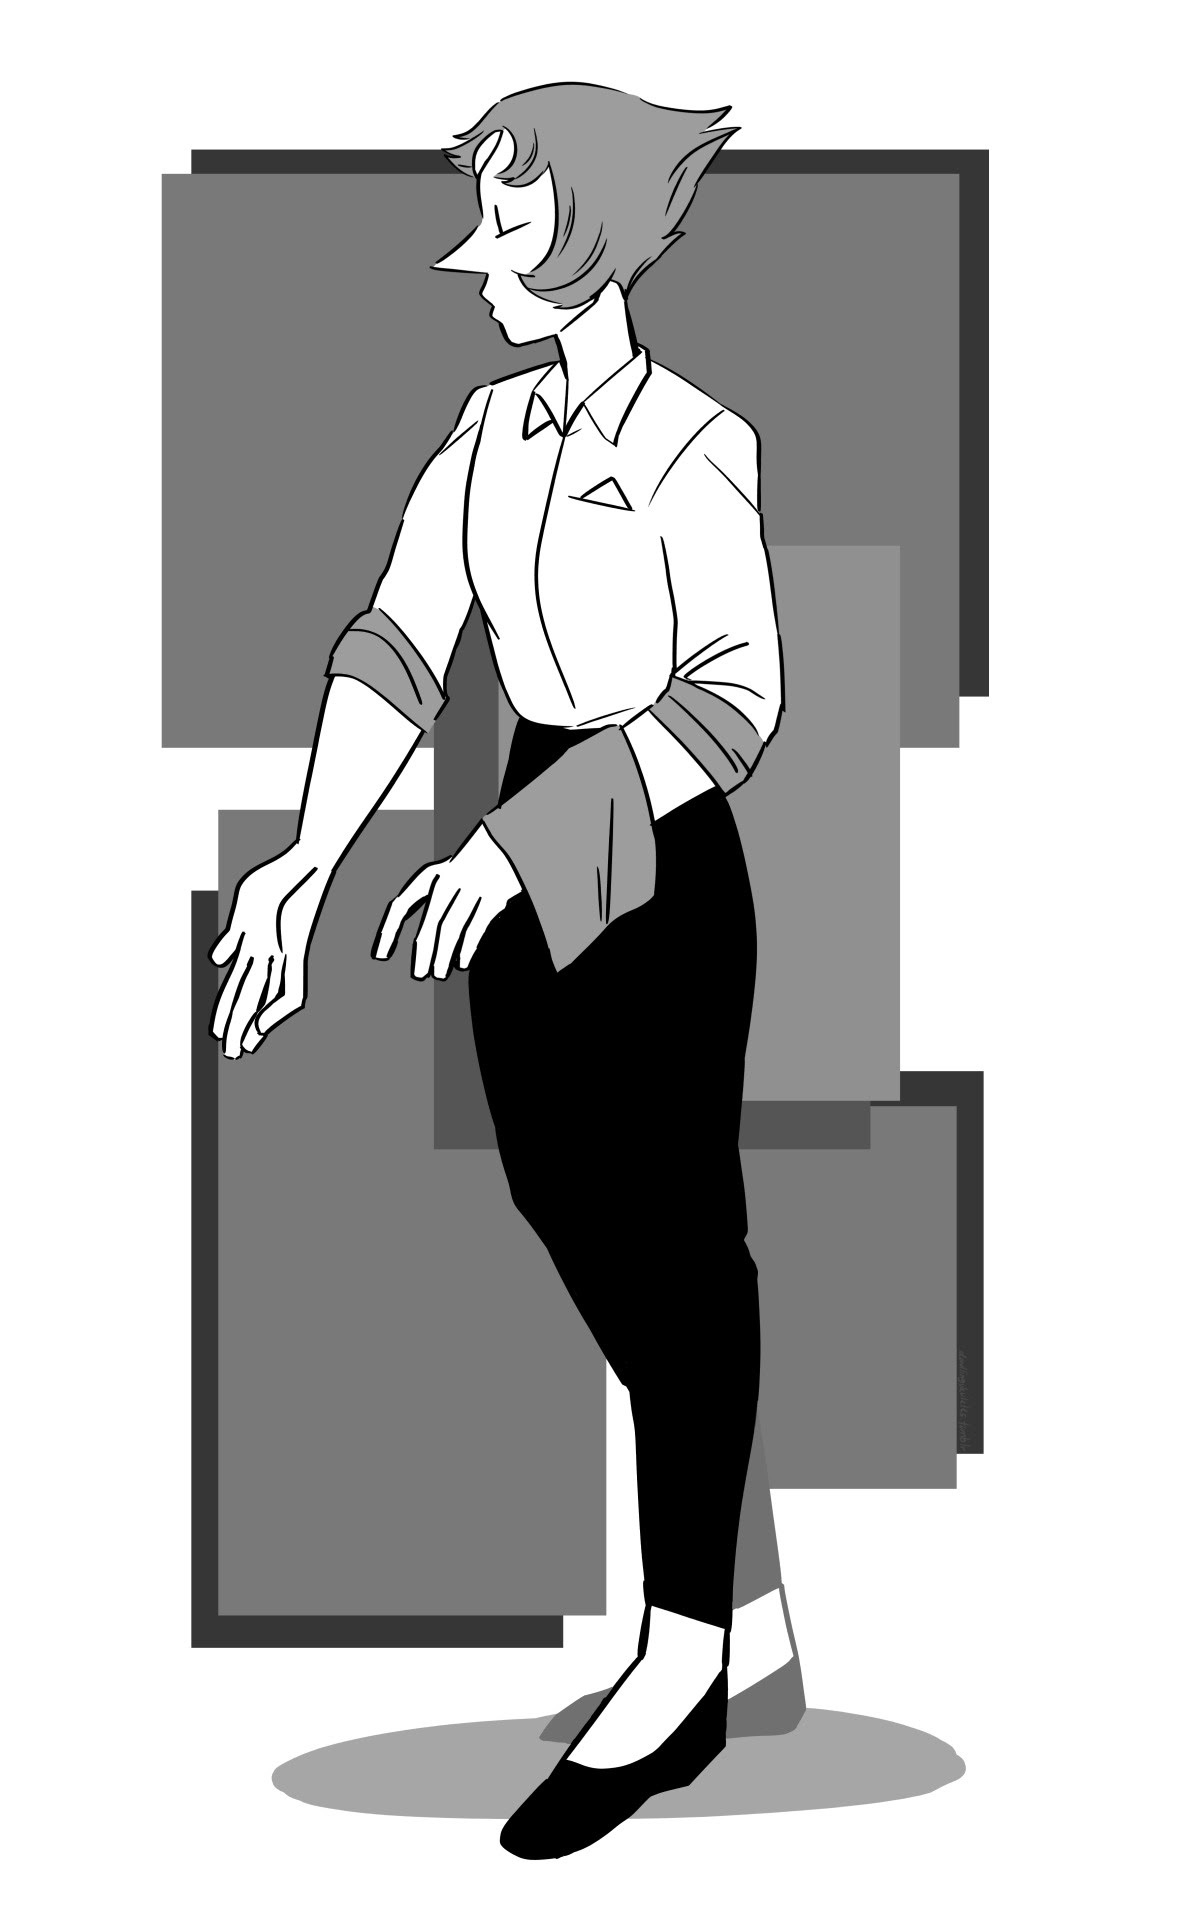 pearl looks really good in formal wear